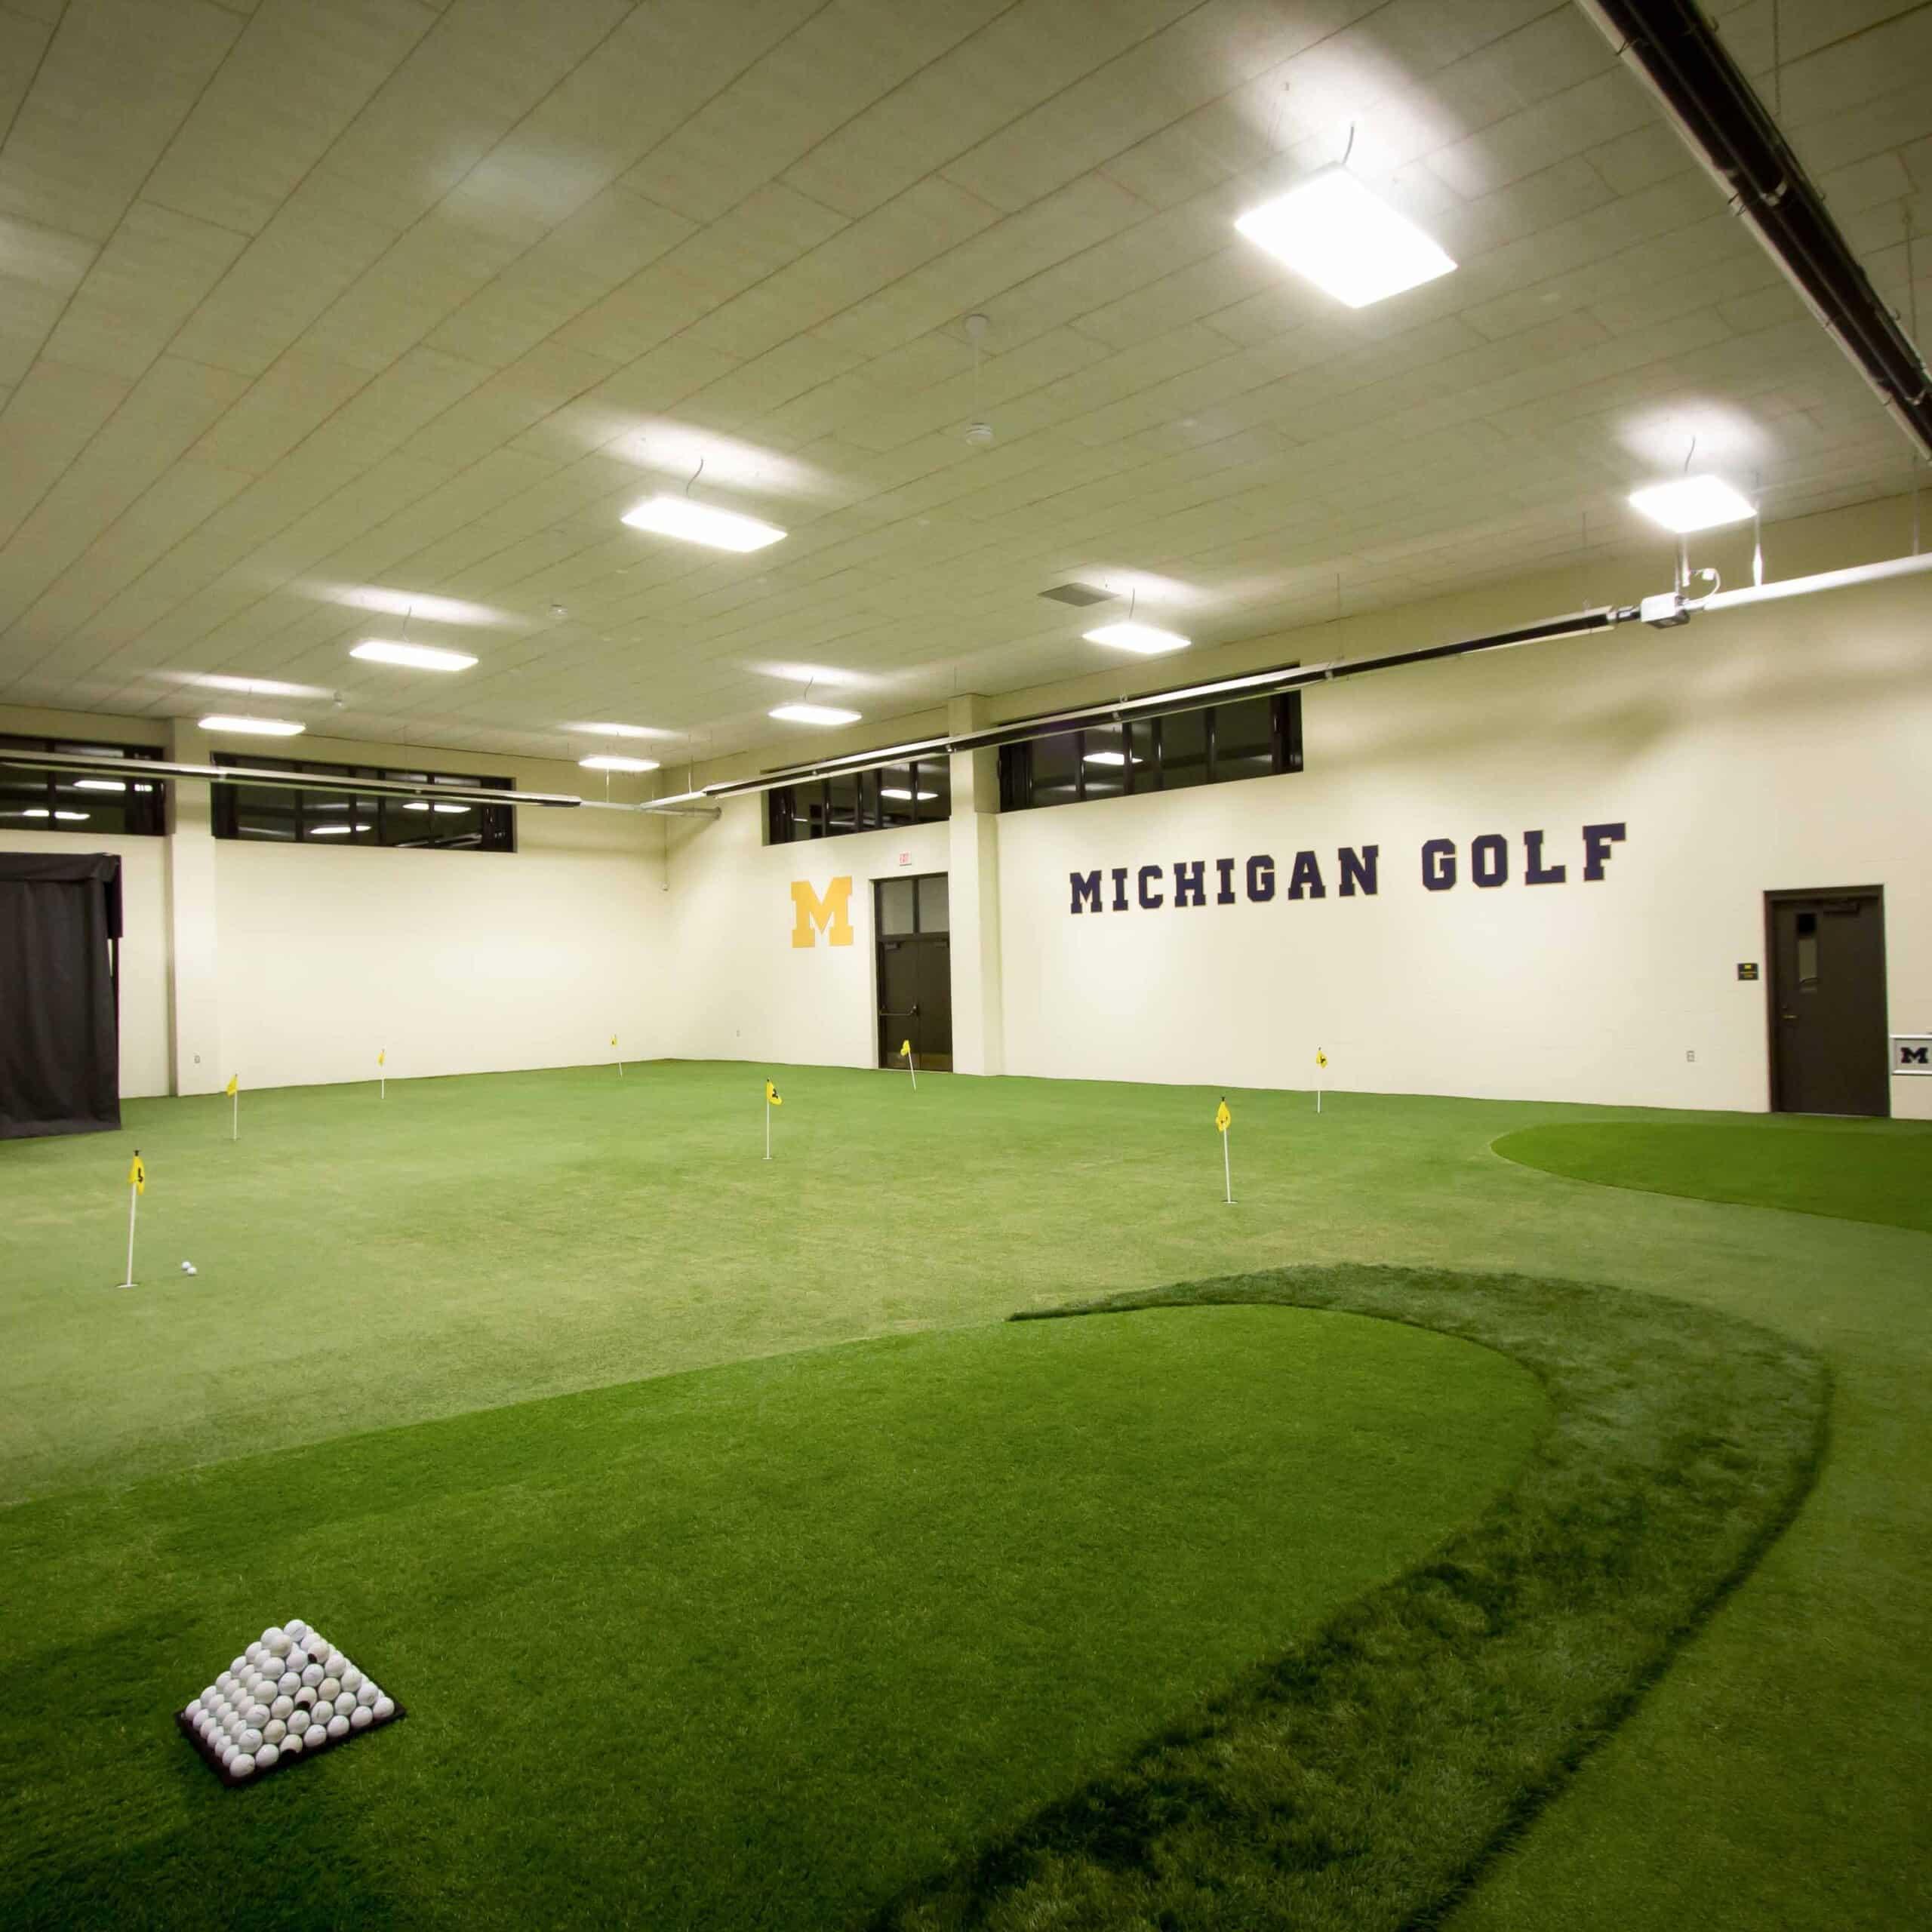 University of michigan weisfeld family golf center a3c for Indoor golf design